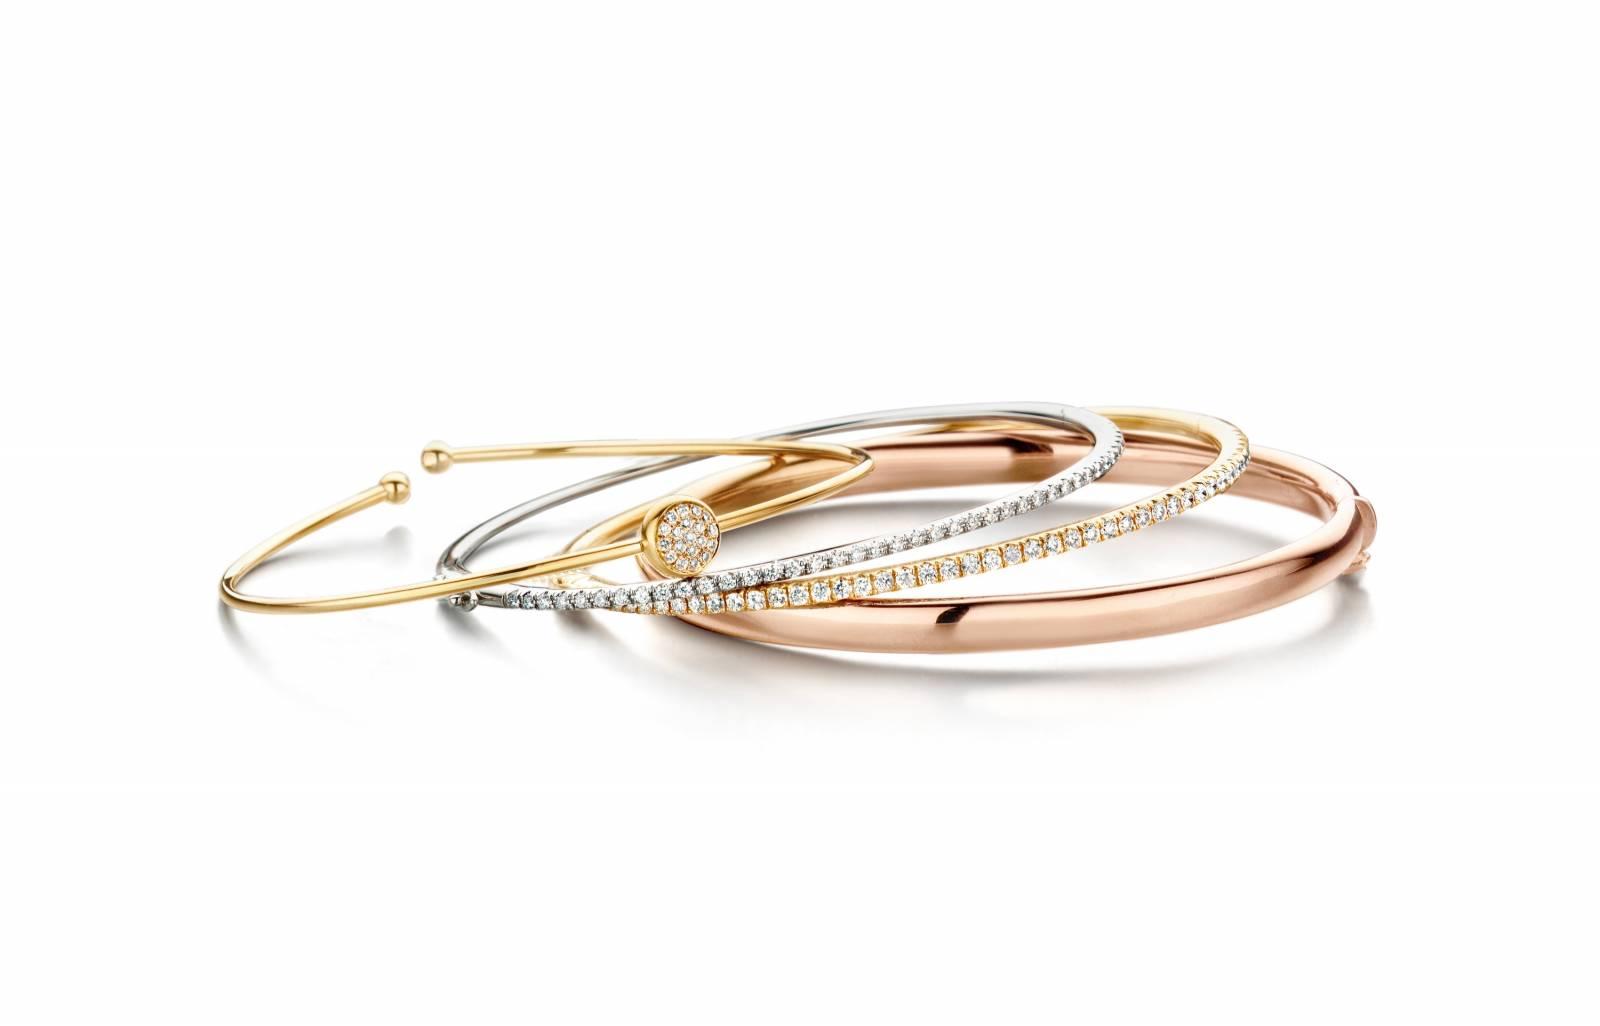 Juwelier Martens - Verlovingsringen - Trouwringen - Juwelen huwelijk - House of Weddings - 4